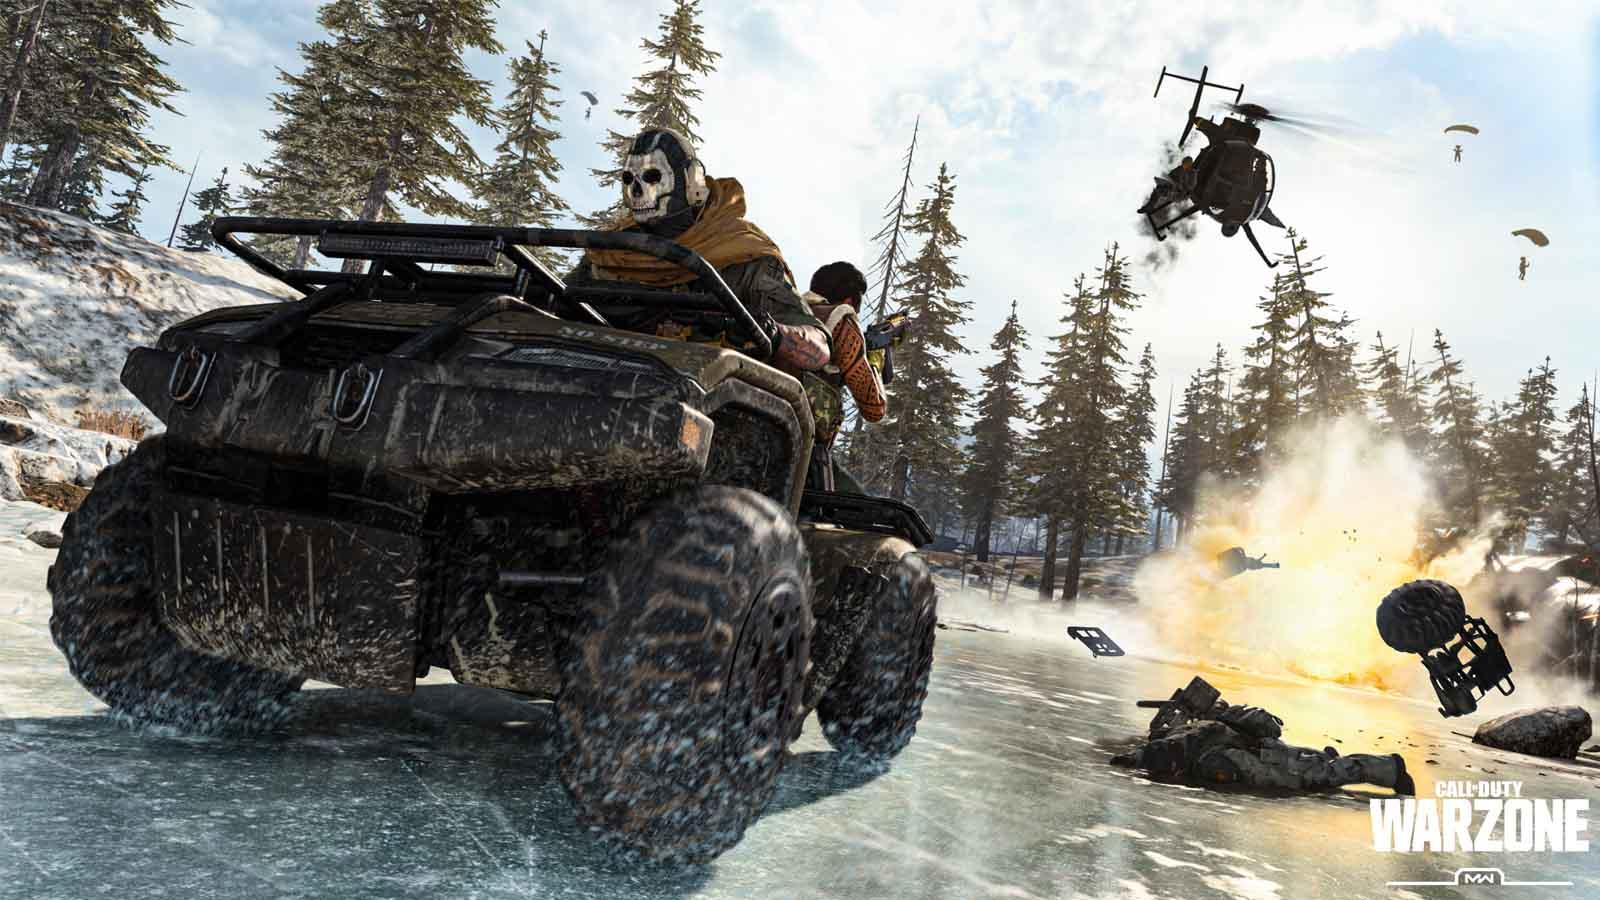 cod warzone gameplay